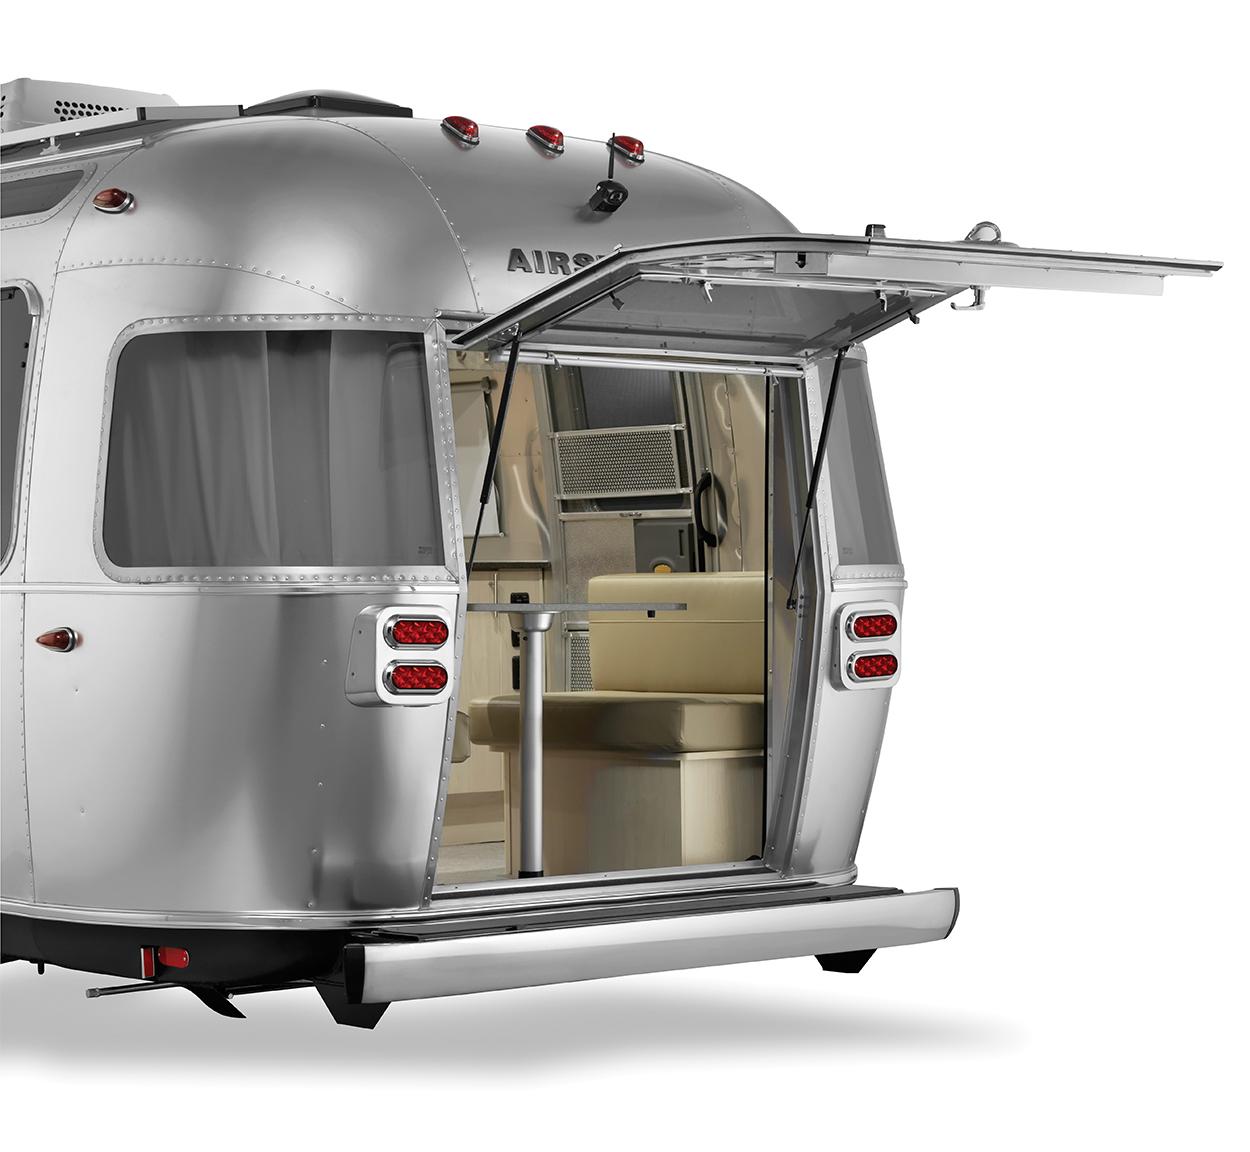 Airstream-Rear-Hatch-Flying-Cloud-25FB-Open